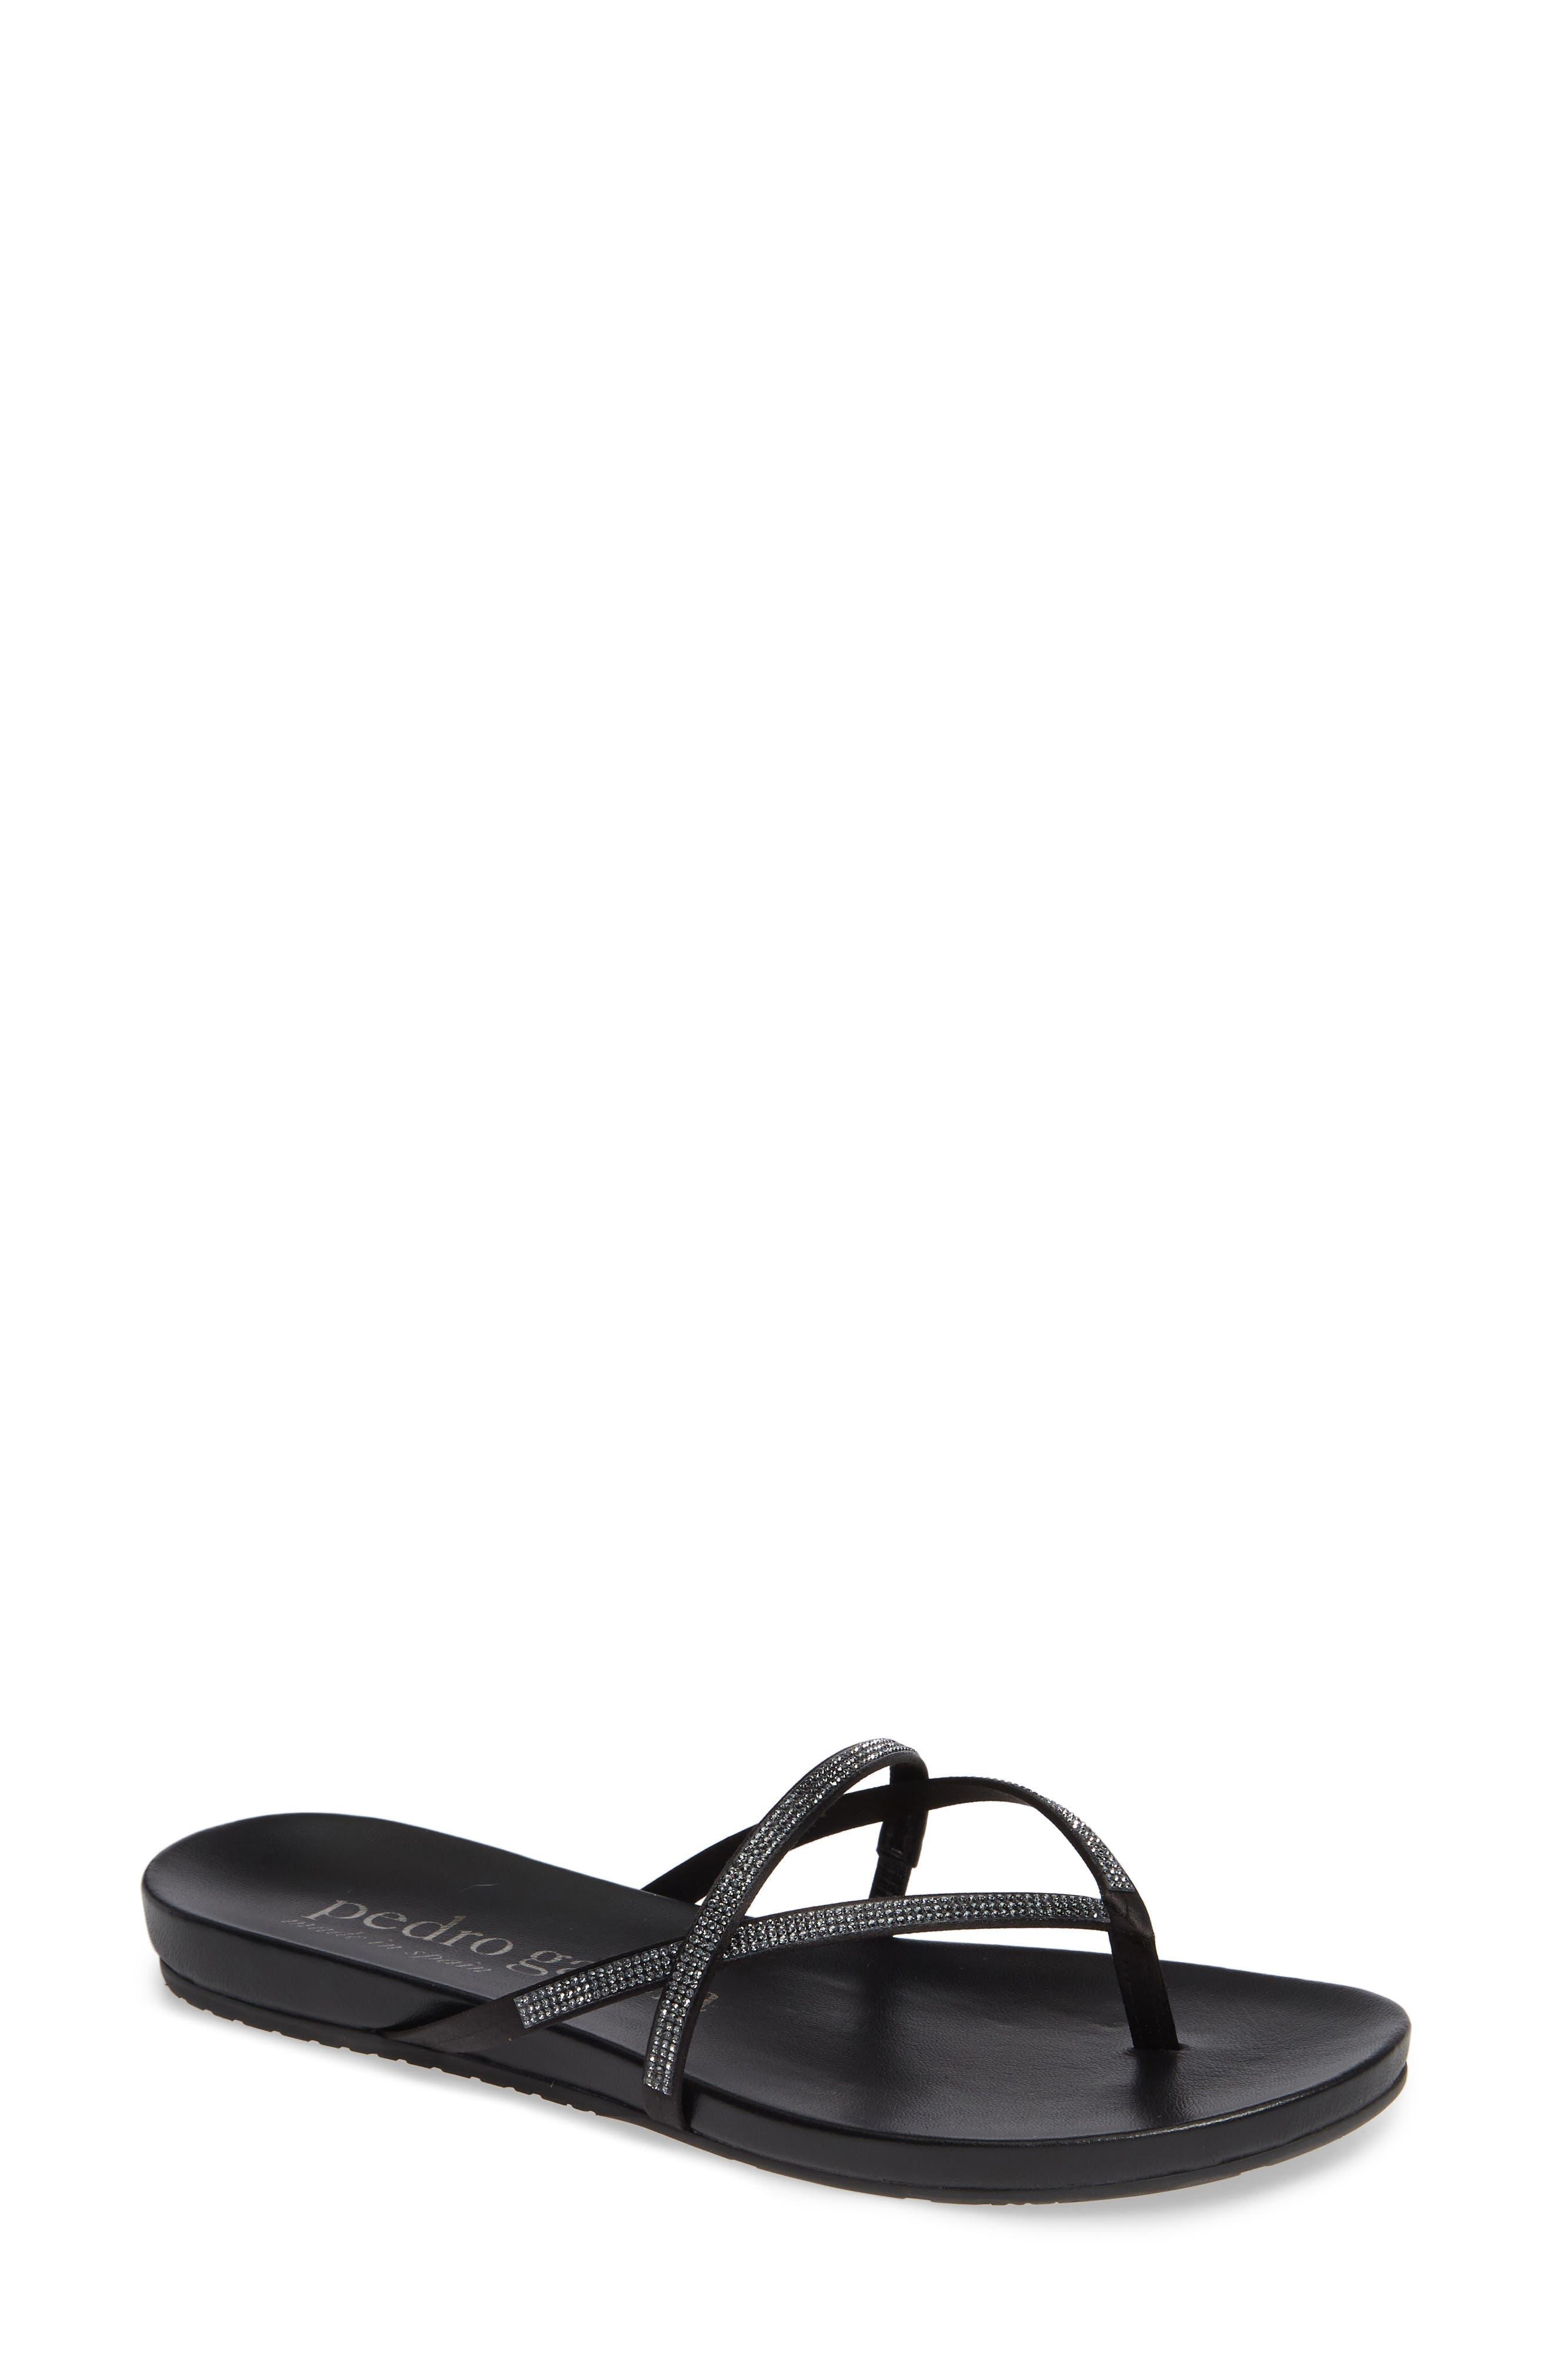 Giulia Crystal Embellished Sandal,                         Main,                         color, METEORITE SATIN